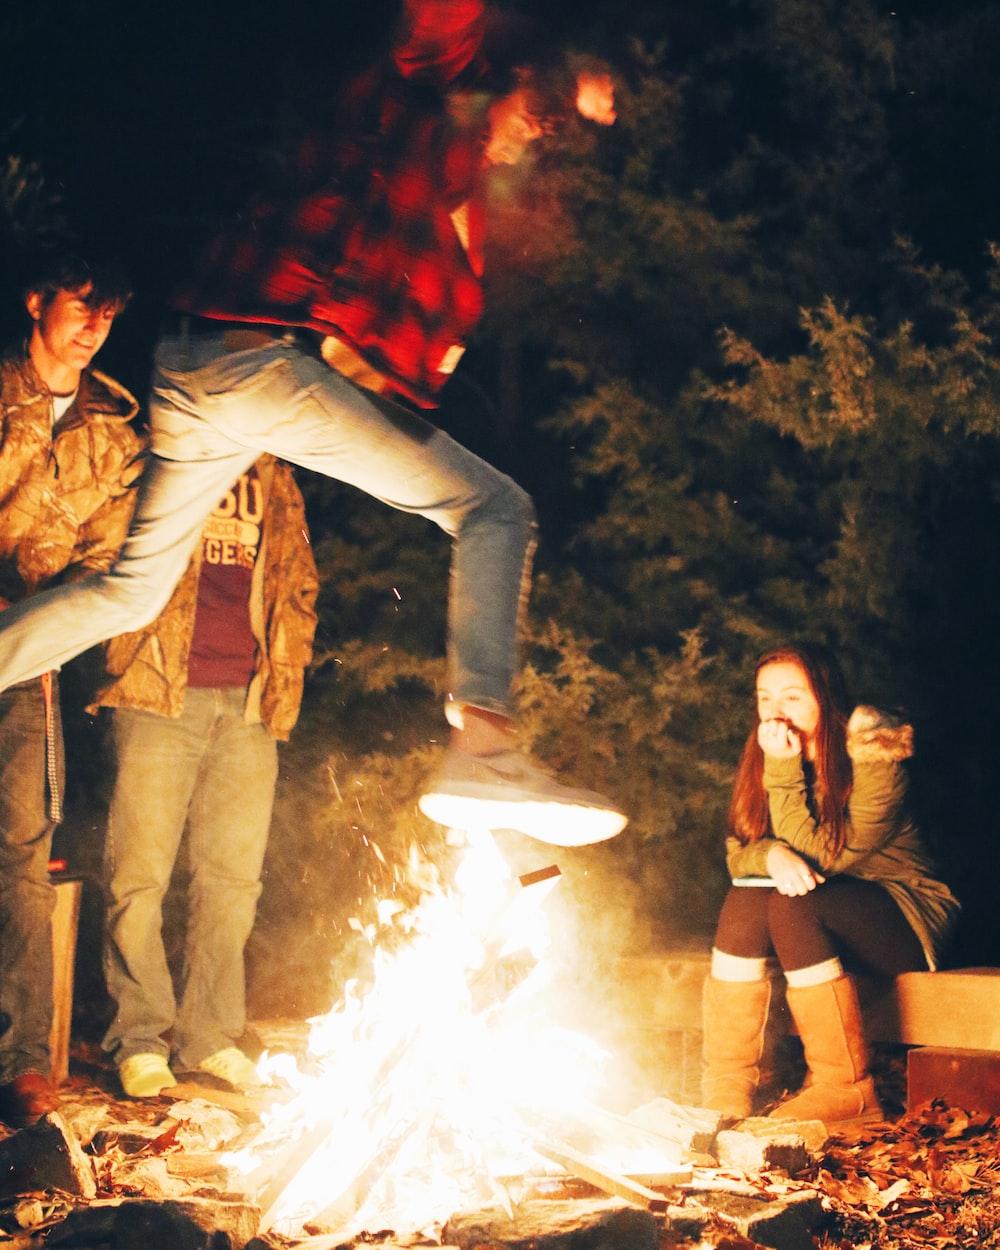 man wearing red and black checked shirt jumping near bonfire